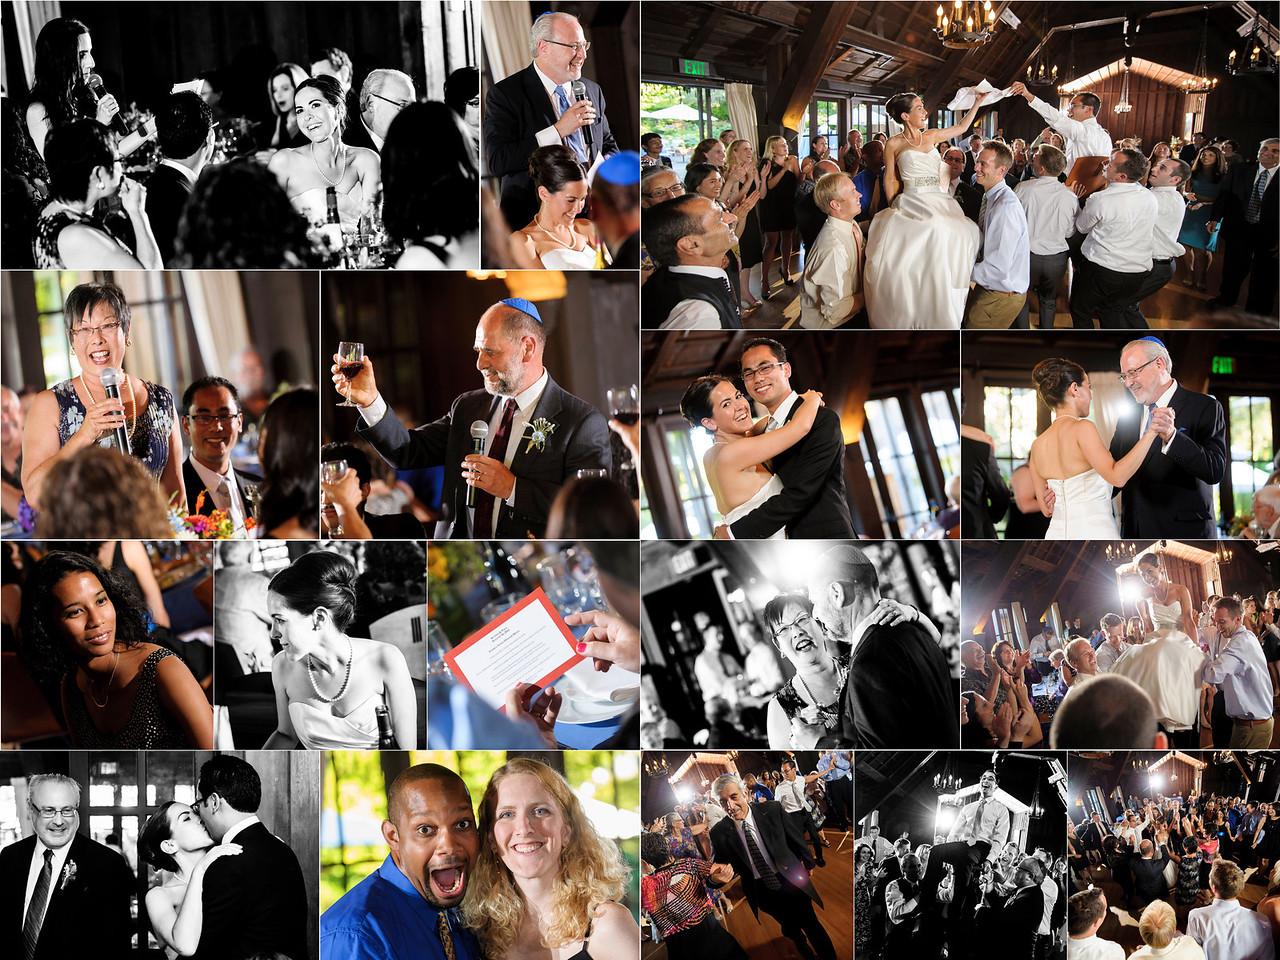 Alyssa_and_Paul_Wedding_Photography_4x6_Photo_Board_06